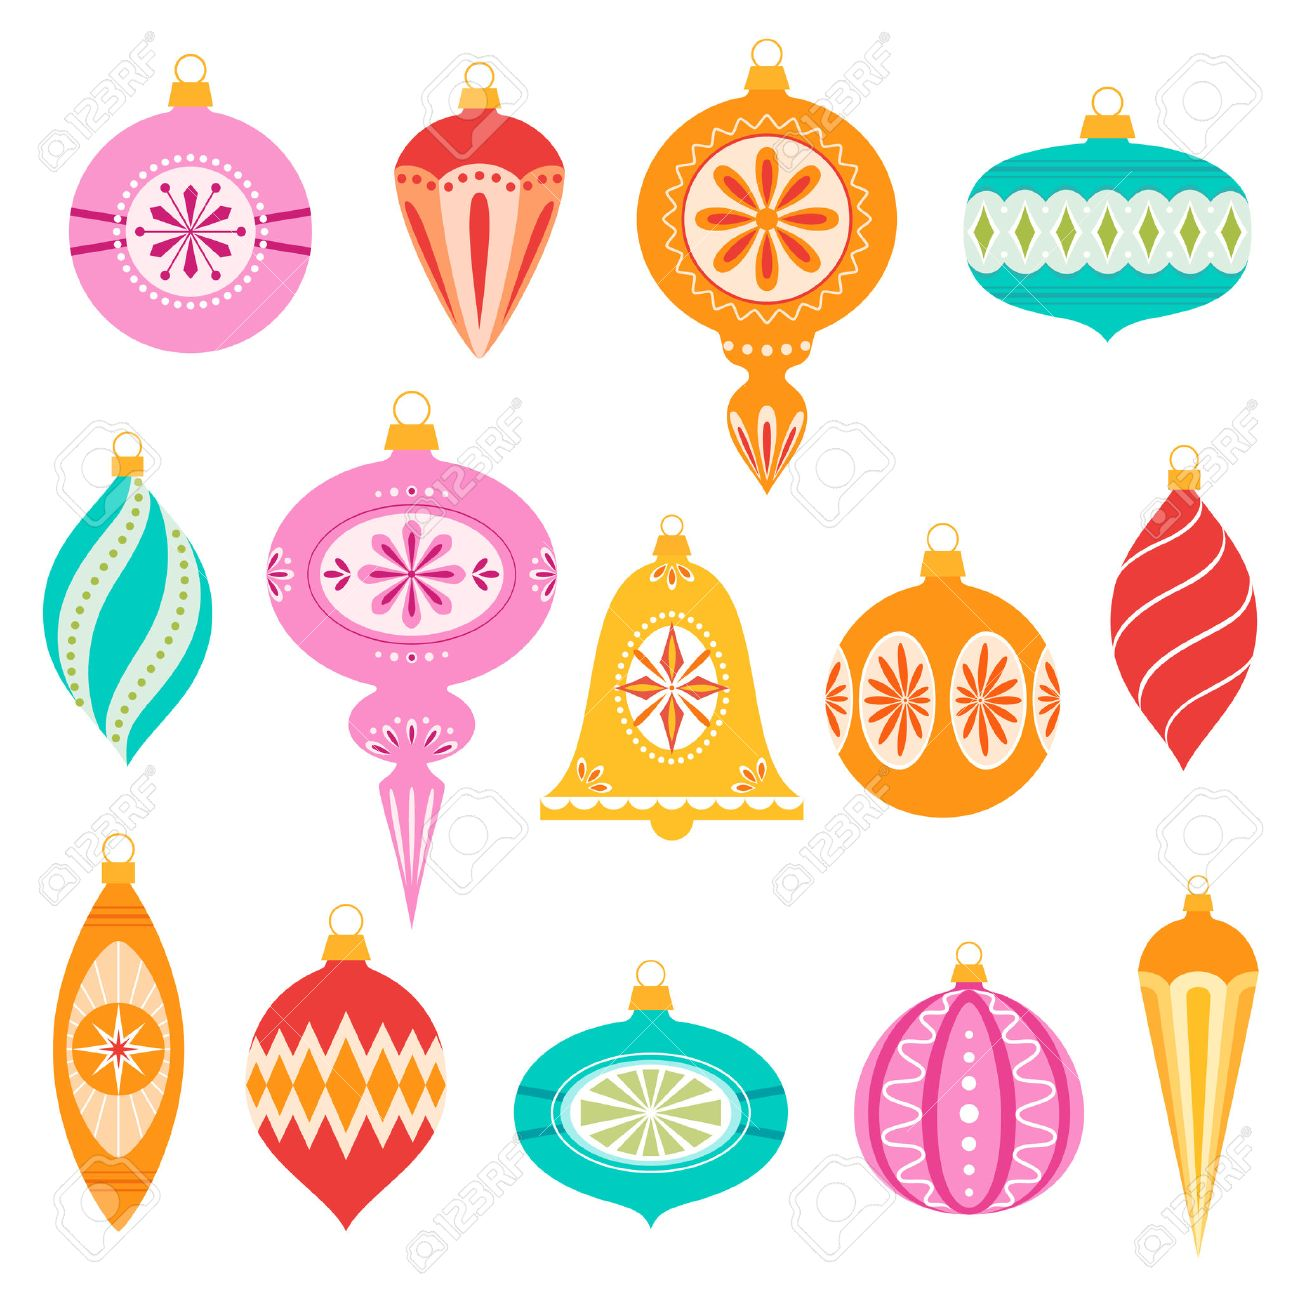 Set Of Retro Christmas Ornaments Stock Vector